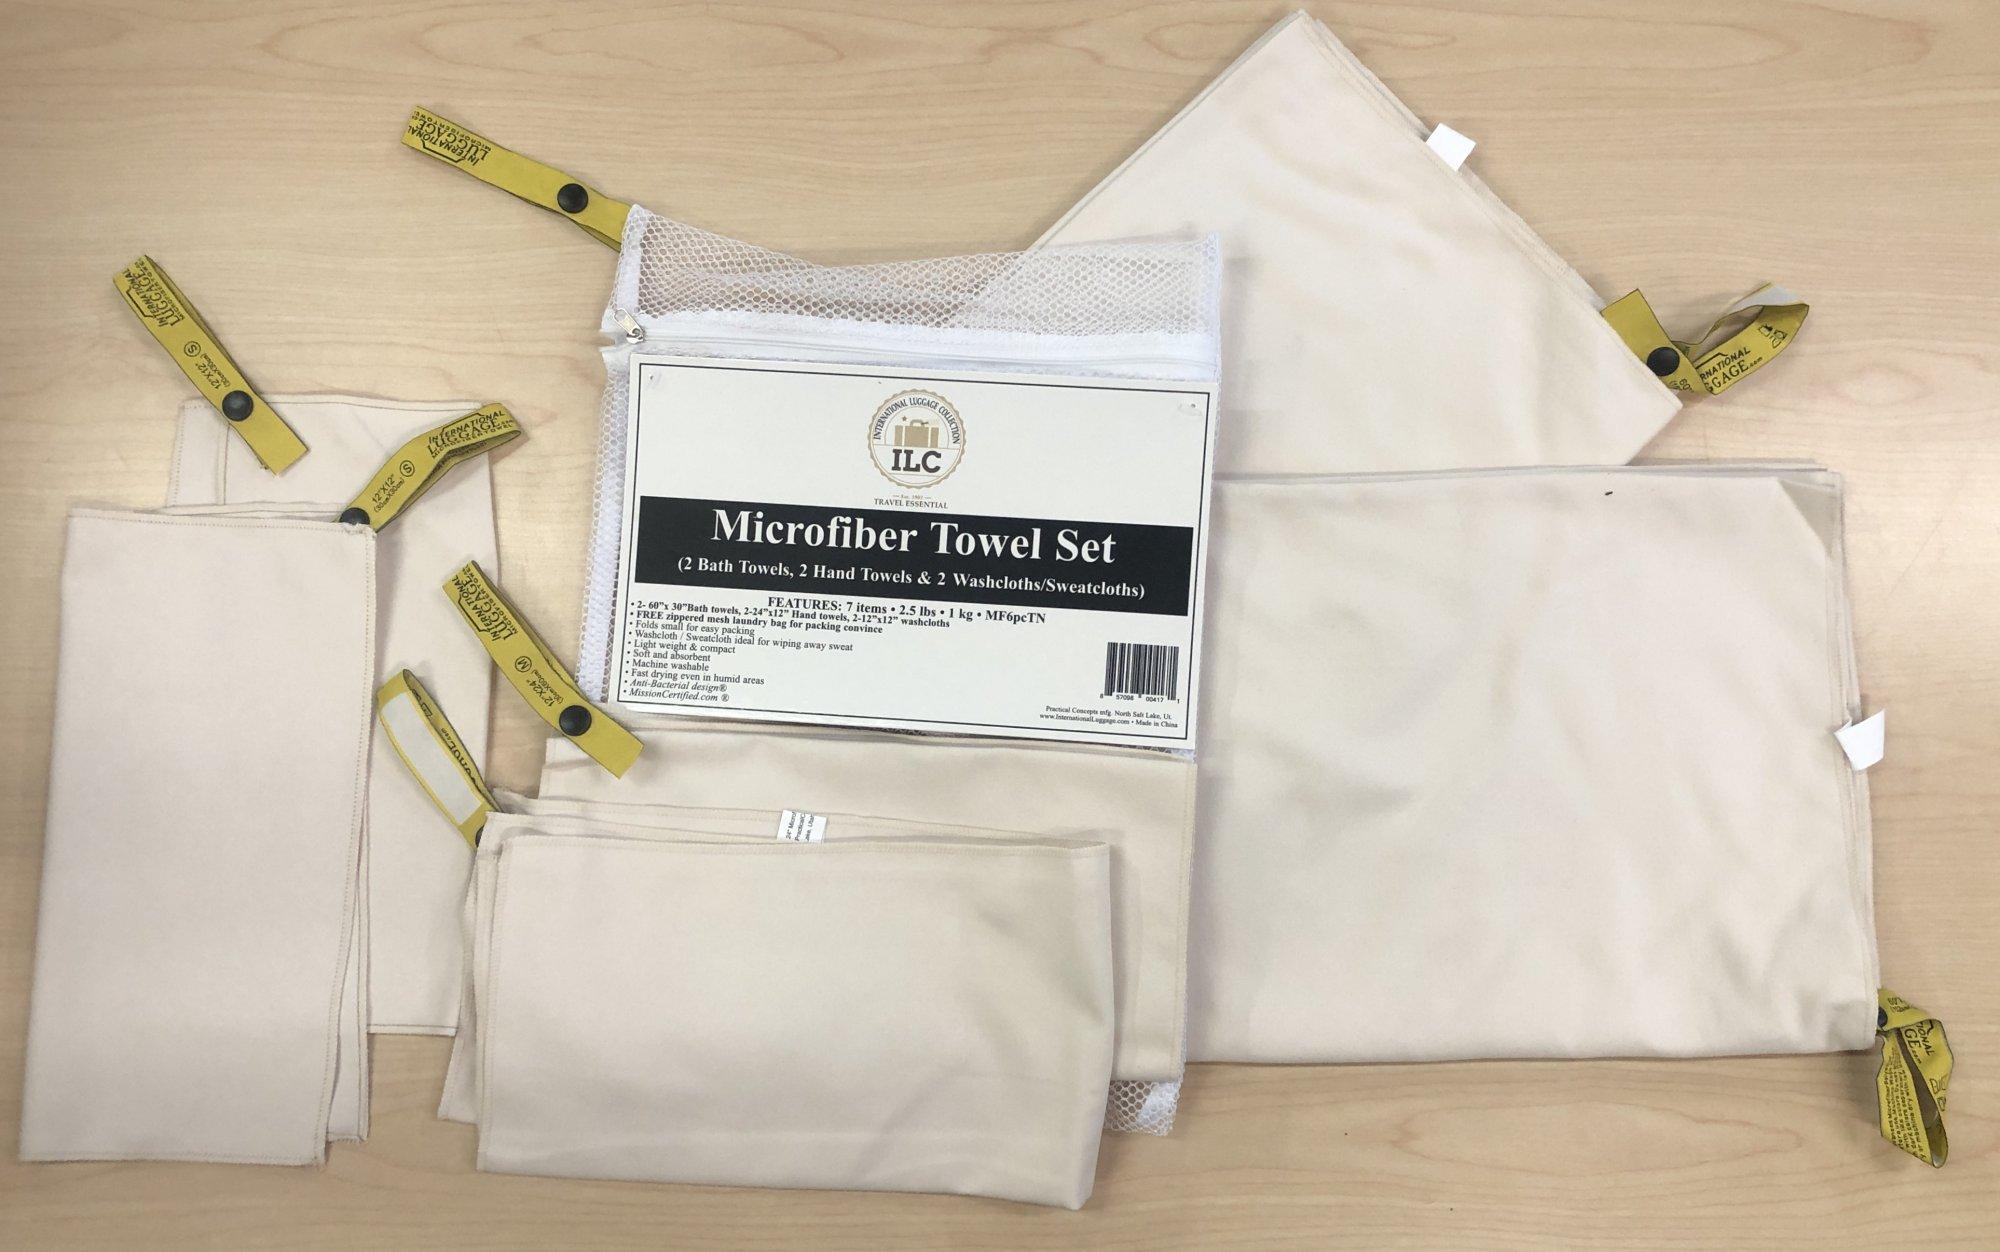 6 piece Microfiber Towel Set (Tan)  International Luggage Collection (White laundry bag)MF6pcsetTN